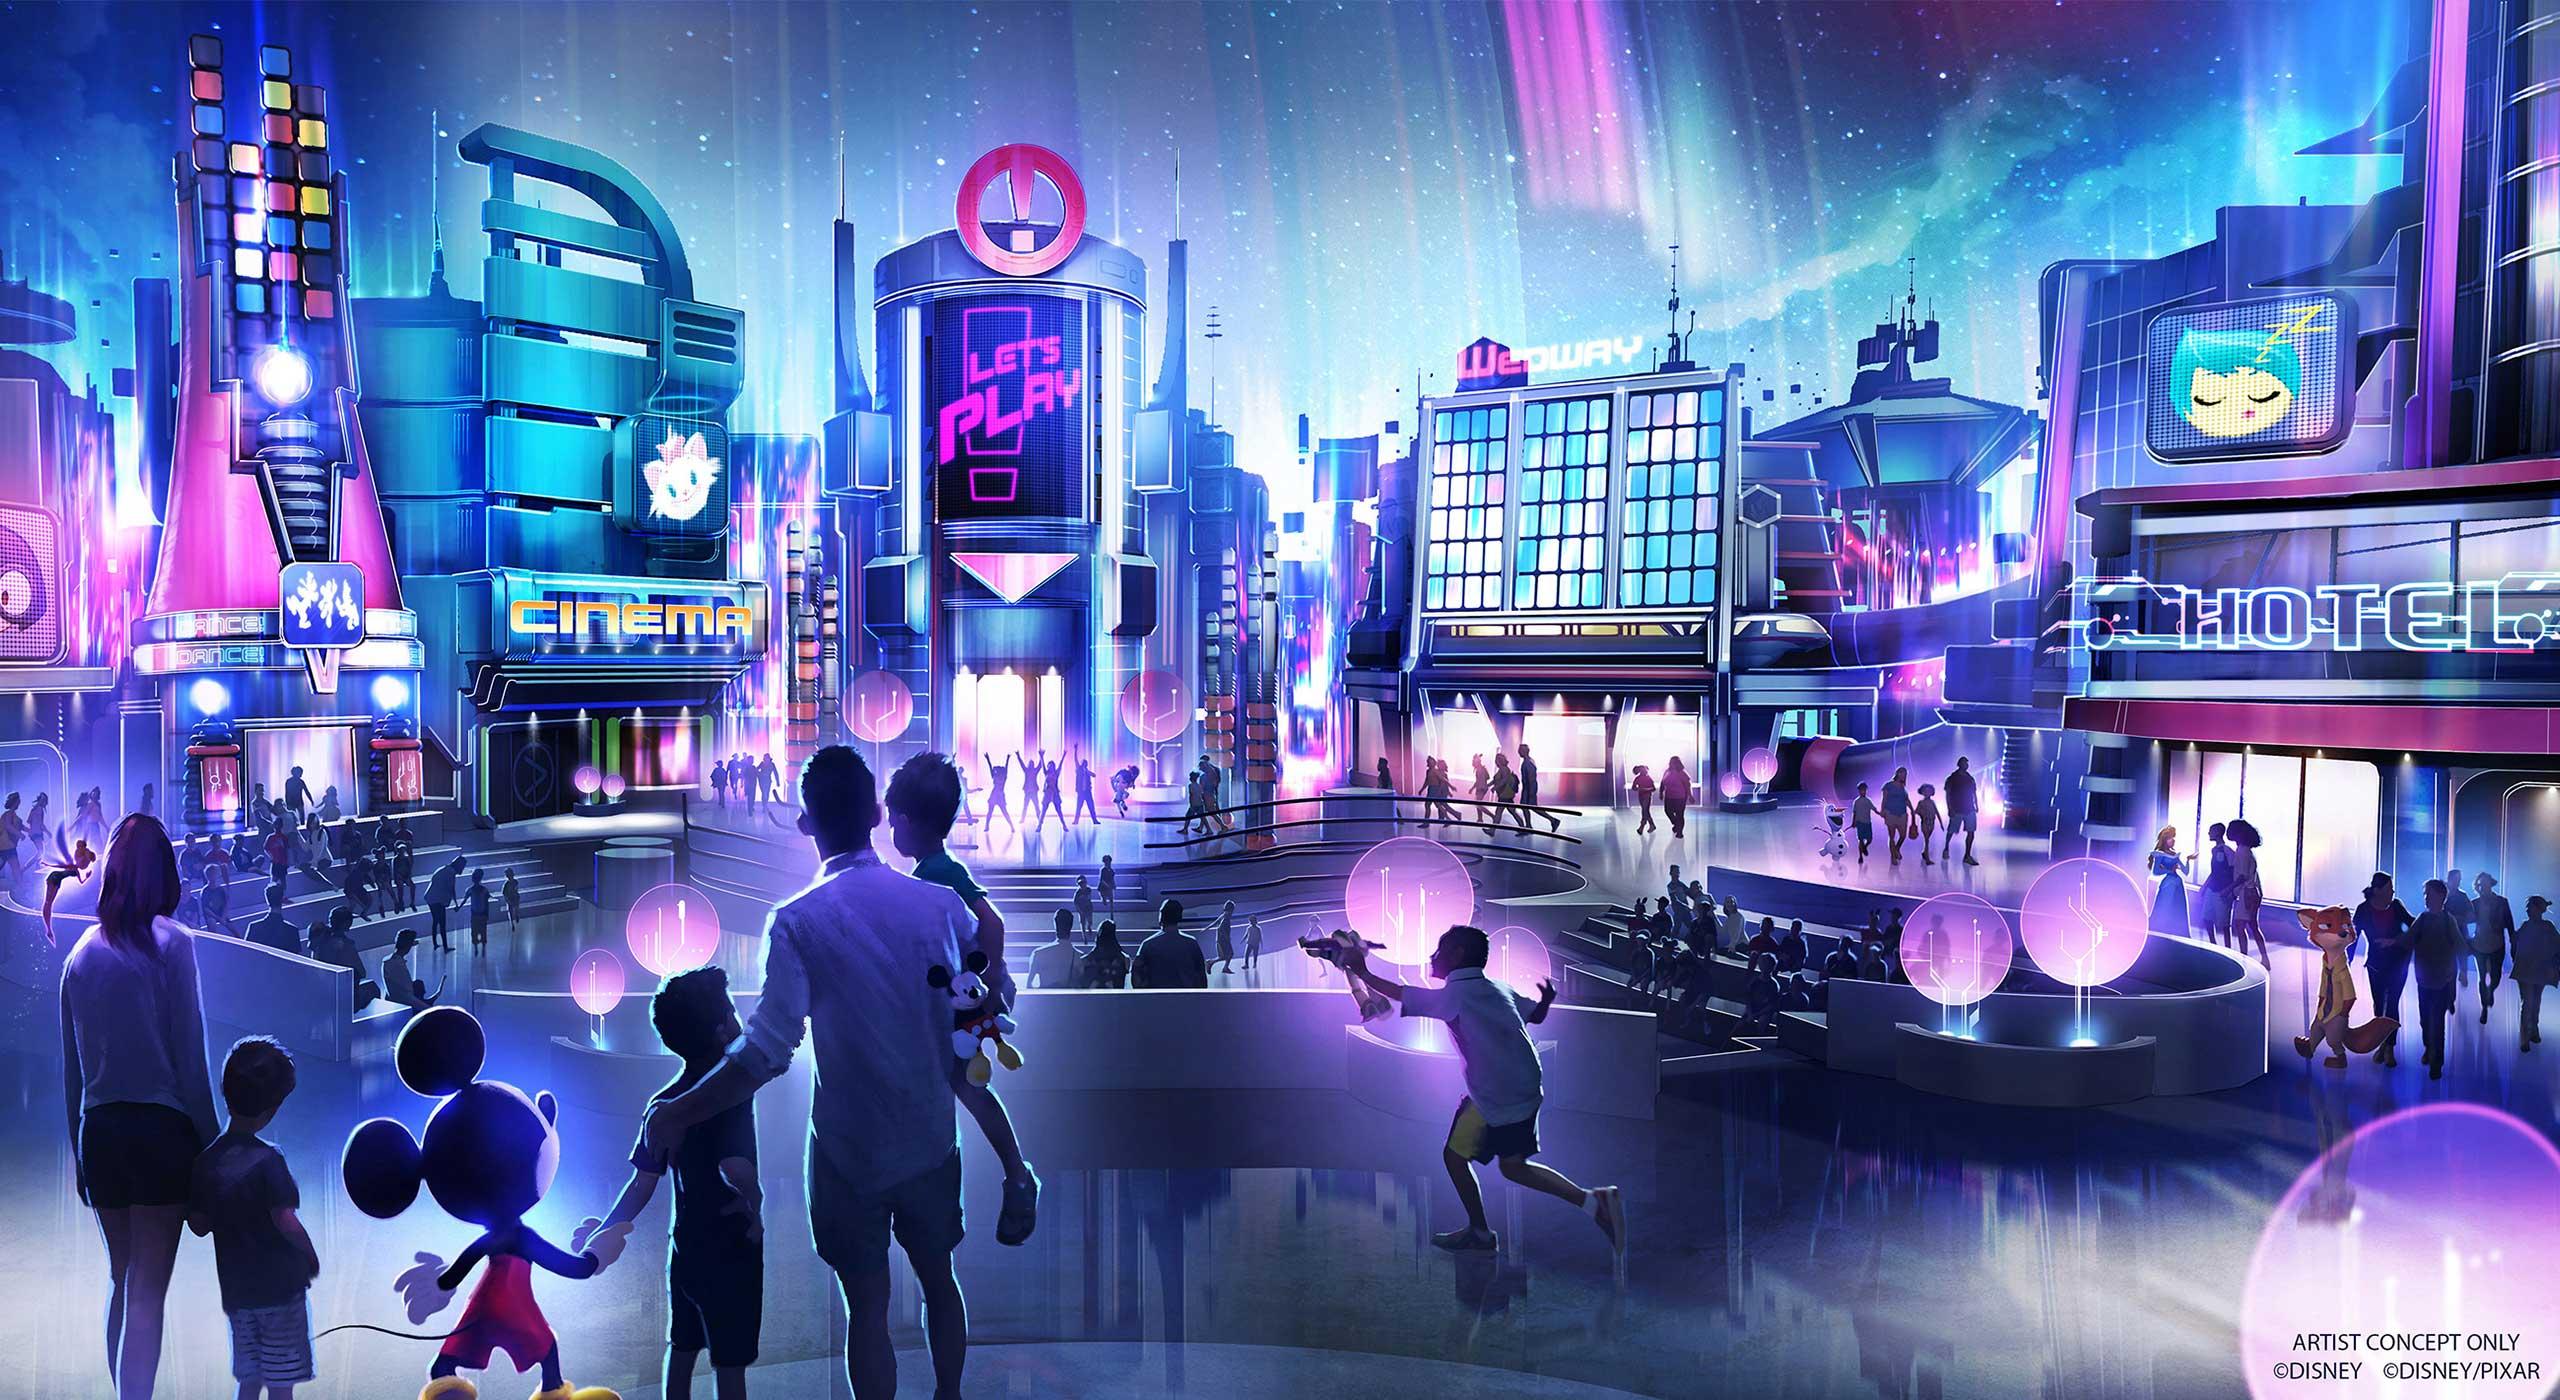 Disney reveals more of Epcot's redevelopment